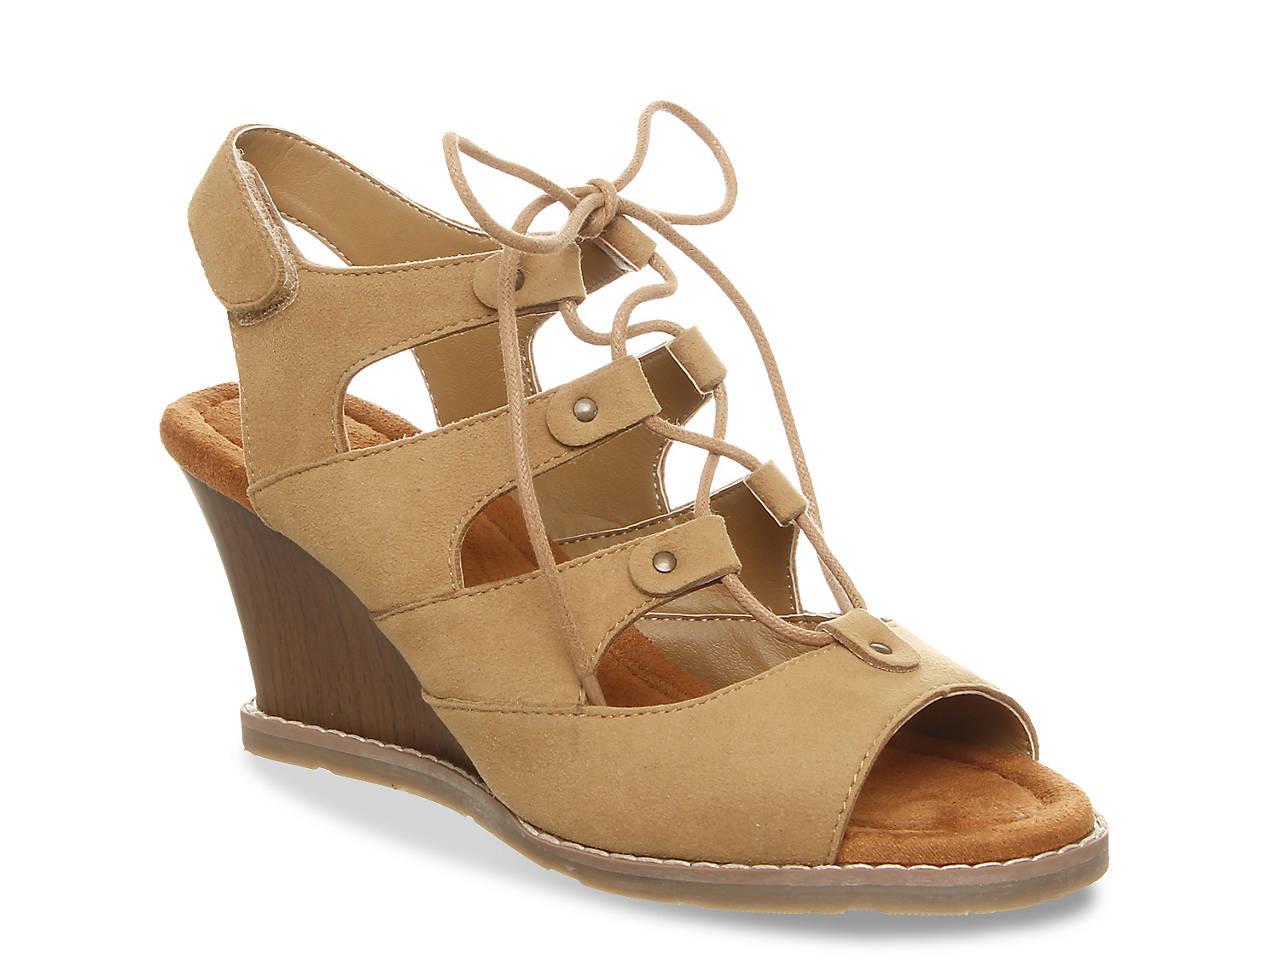 Bearpaw Rhonda Women's Casual Shoes (Sand Or Black)